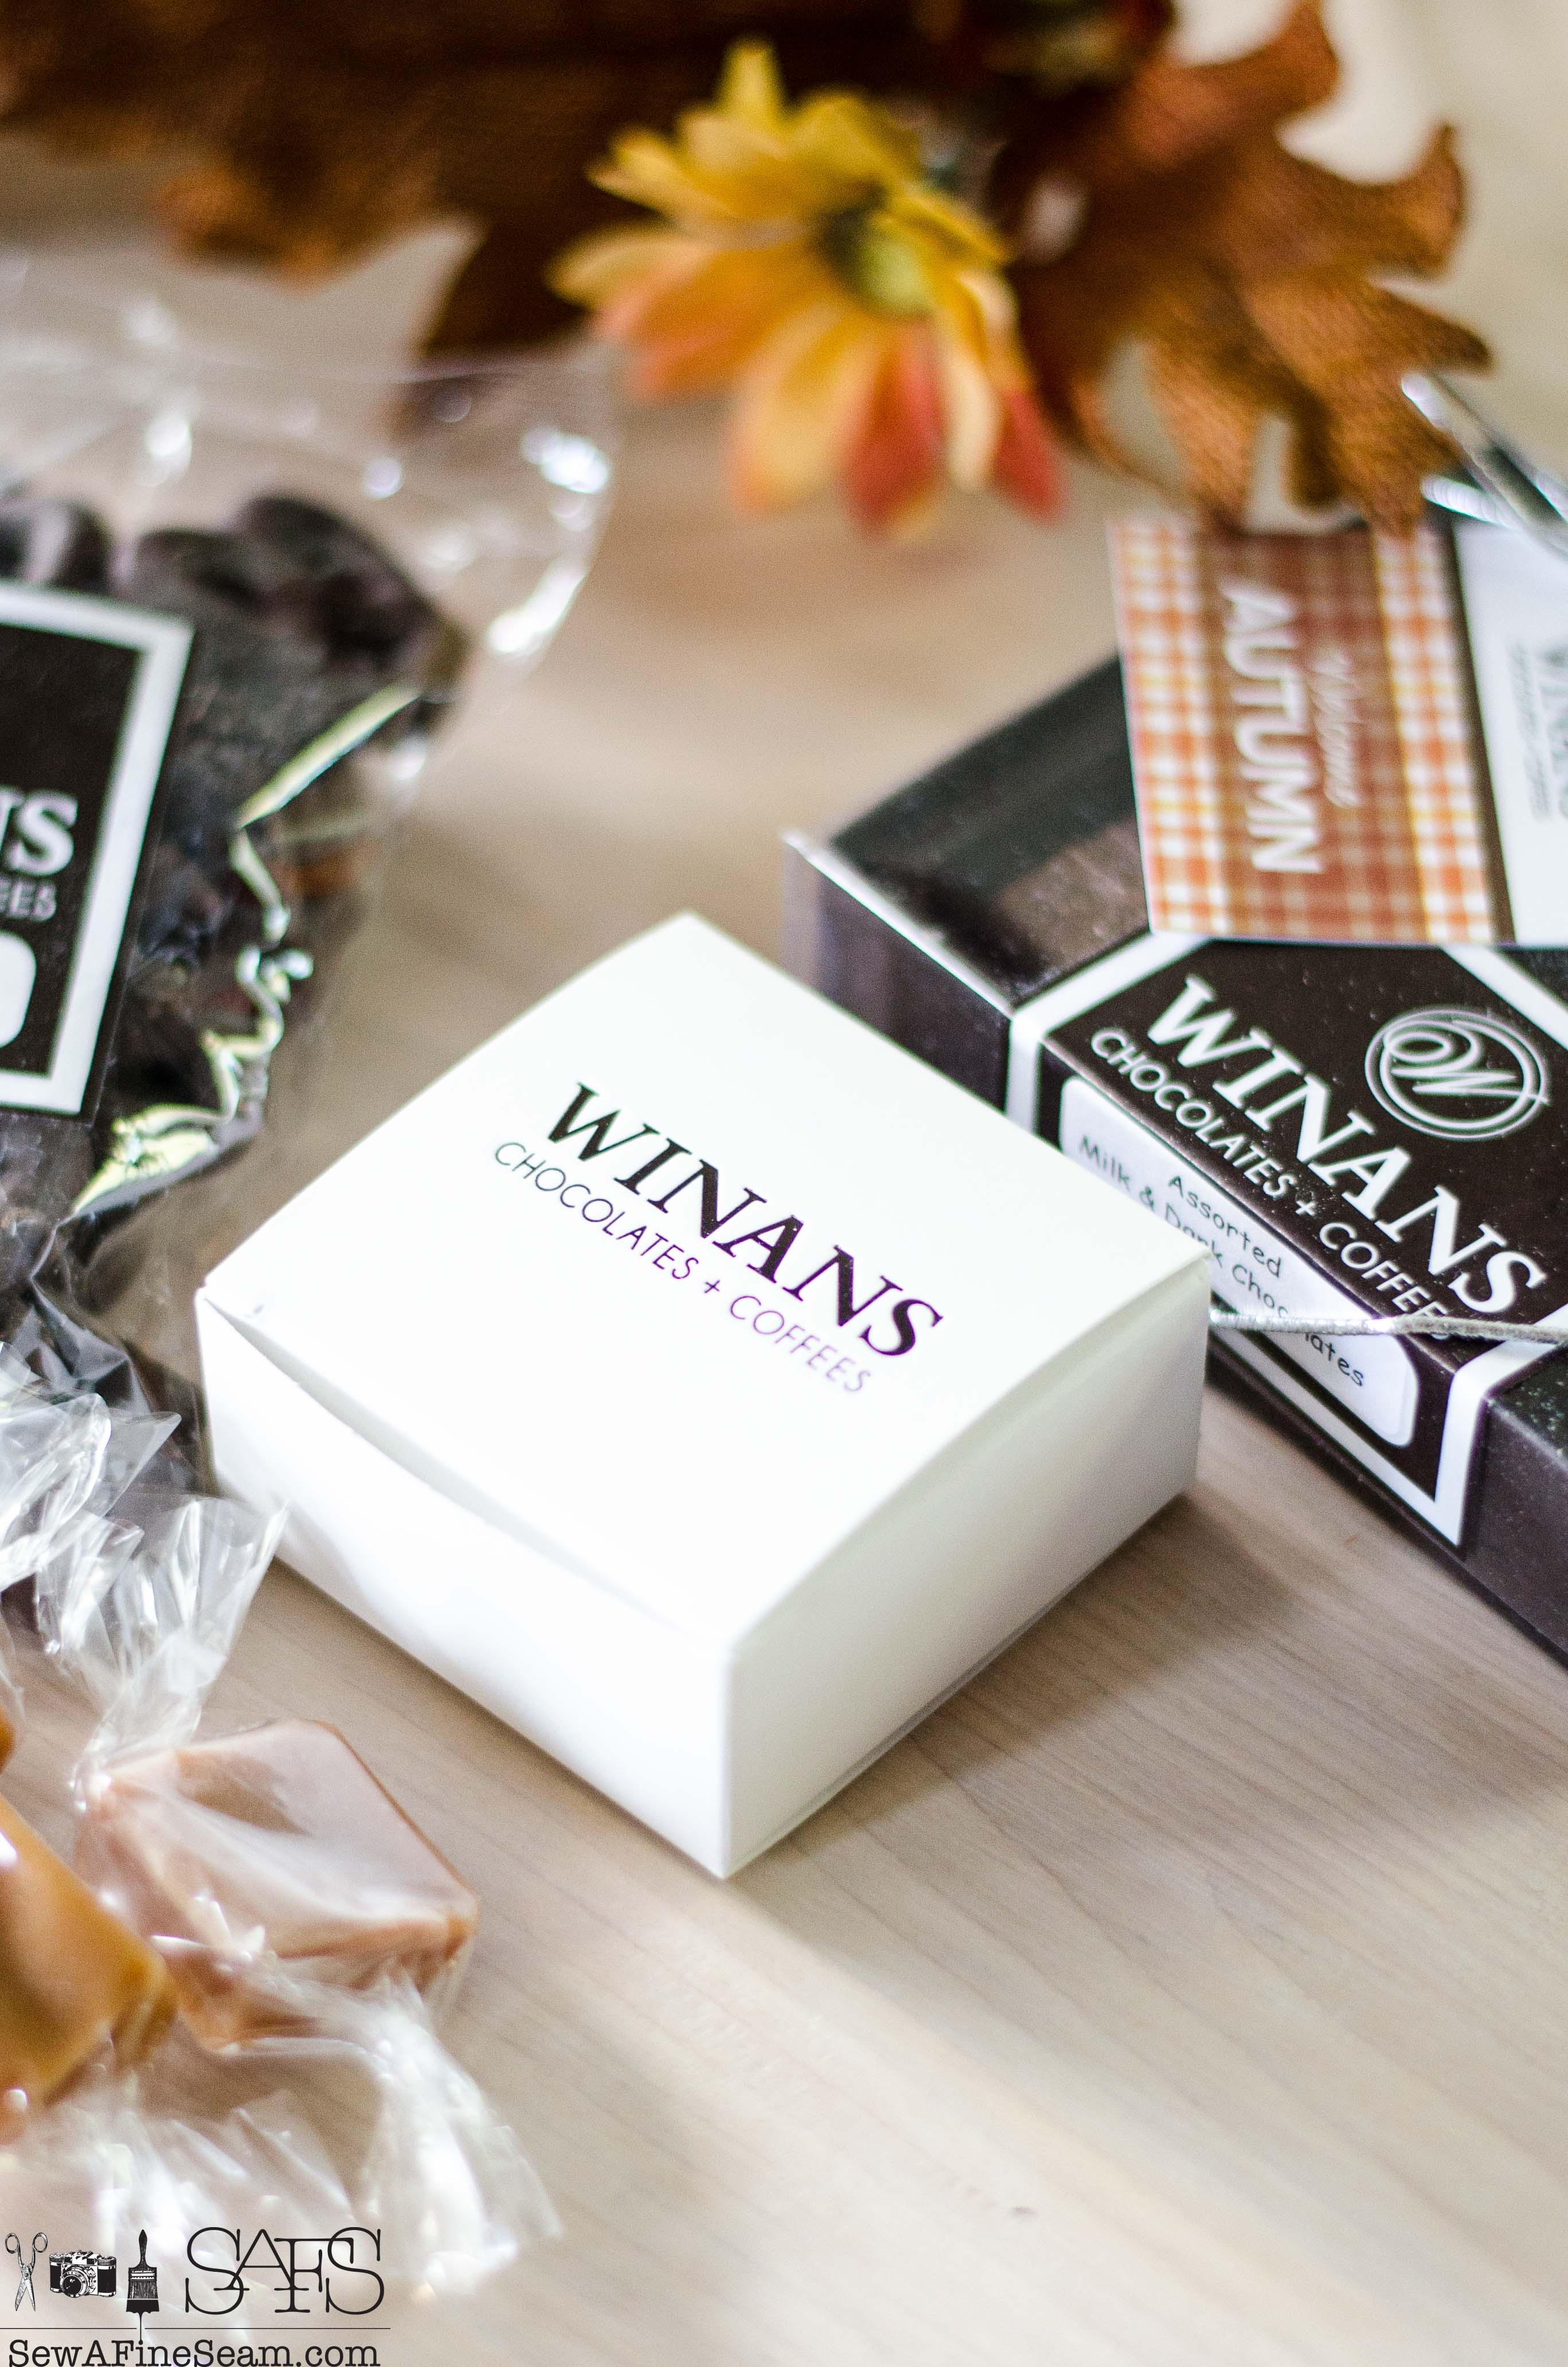 Winans Chocolates and Coffees | Sew a Fine Seam